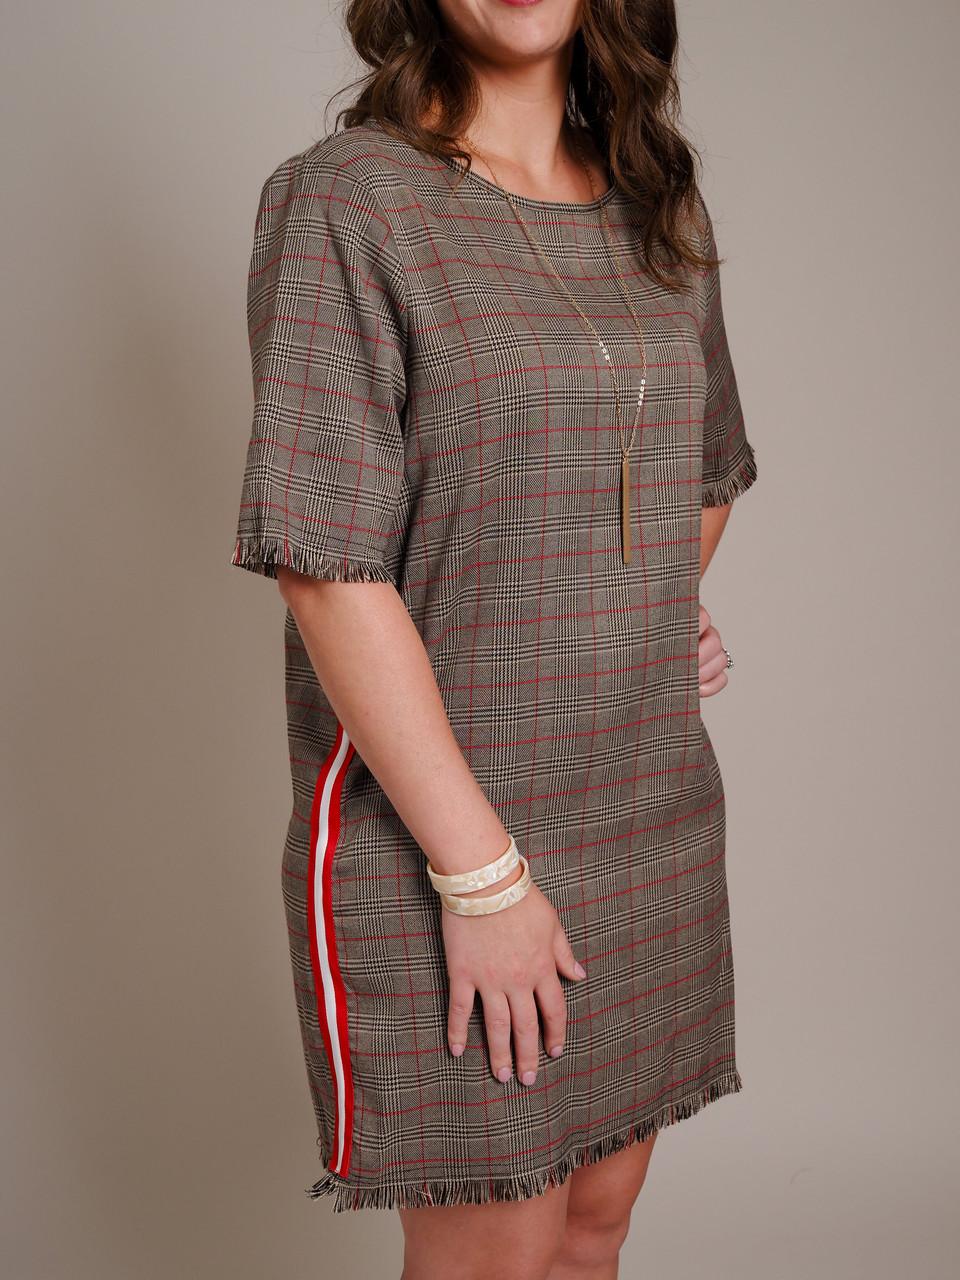 brown racer stripe dress